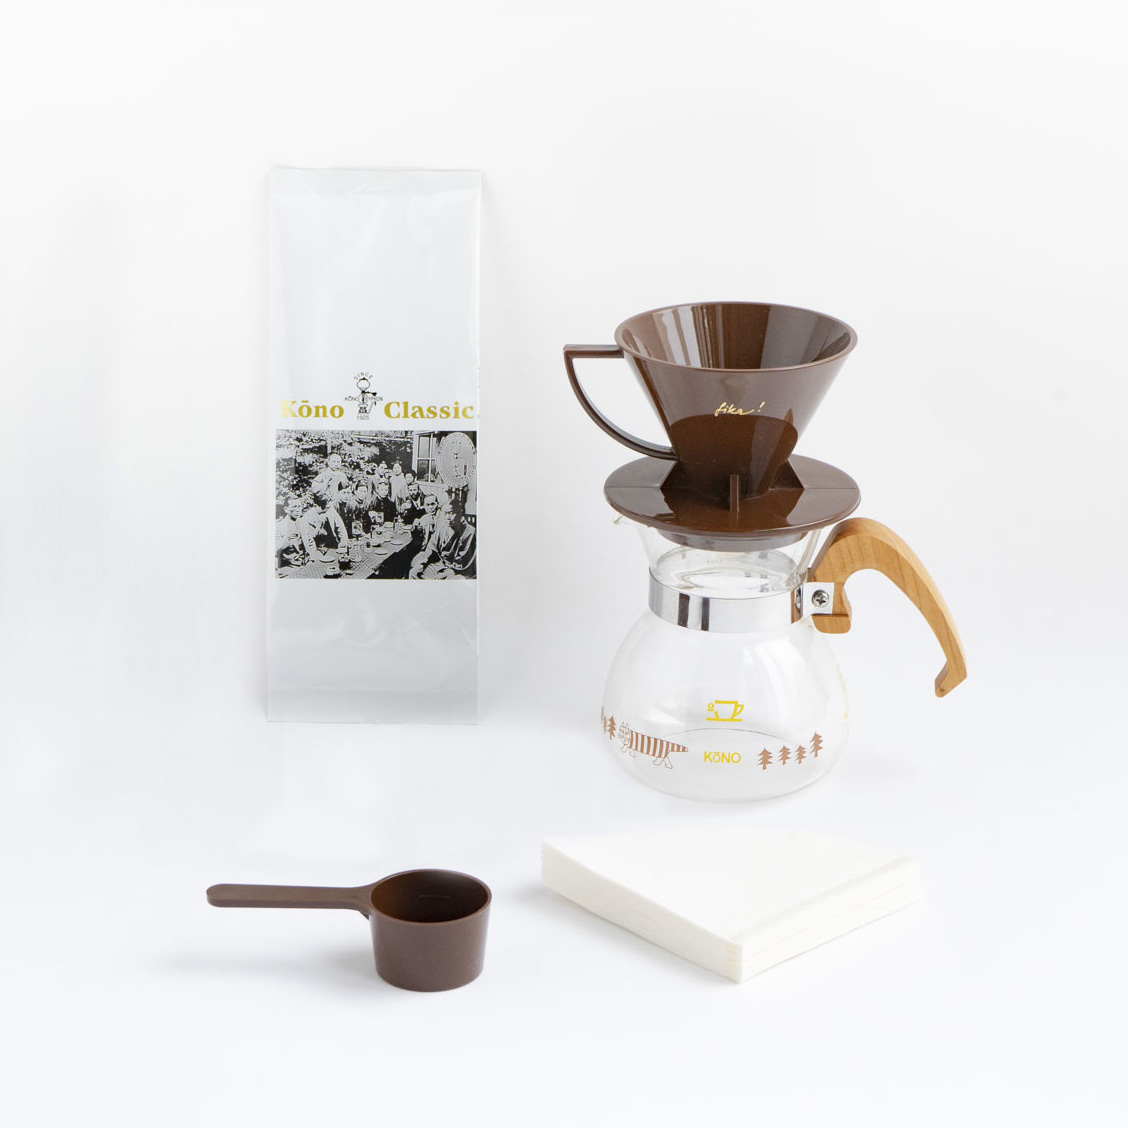 【TK】(Y)【2021年9月下旬以降順次出荷予定】KONO式コーヒードリッパーセット(木と大地のブラウン)